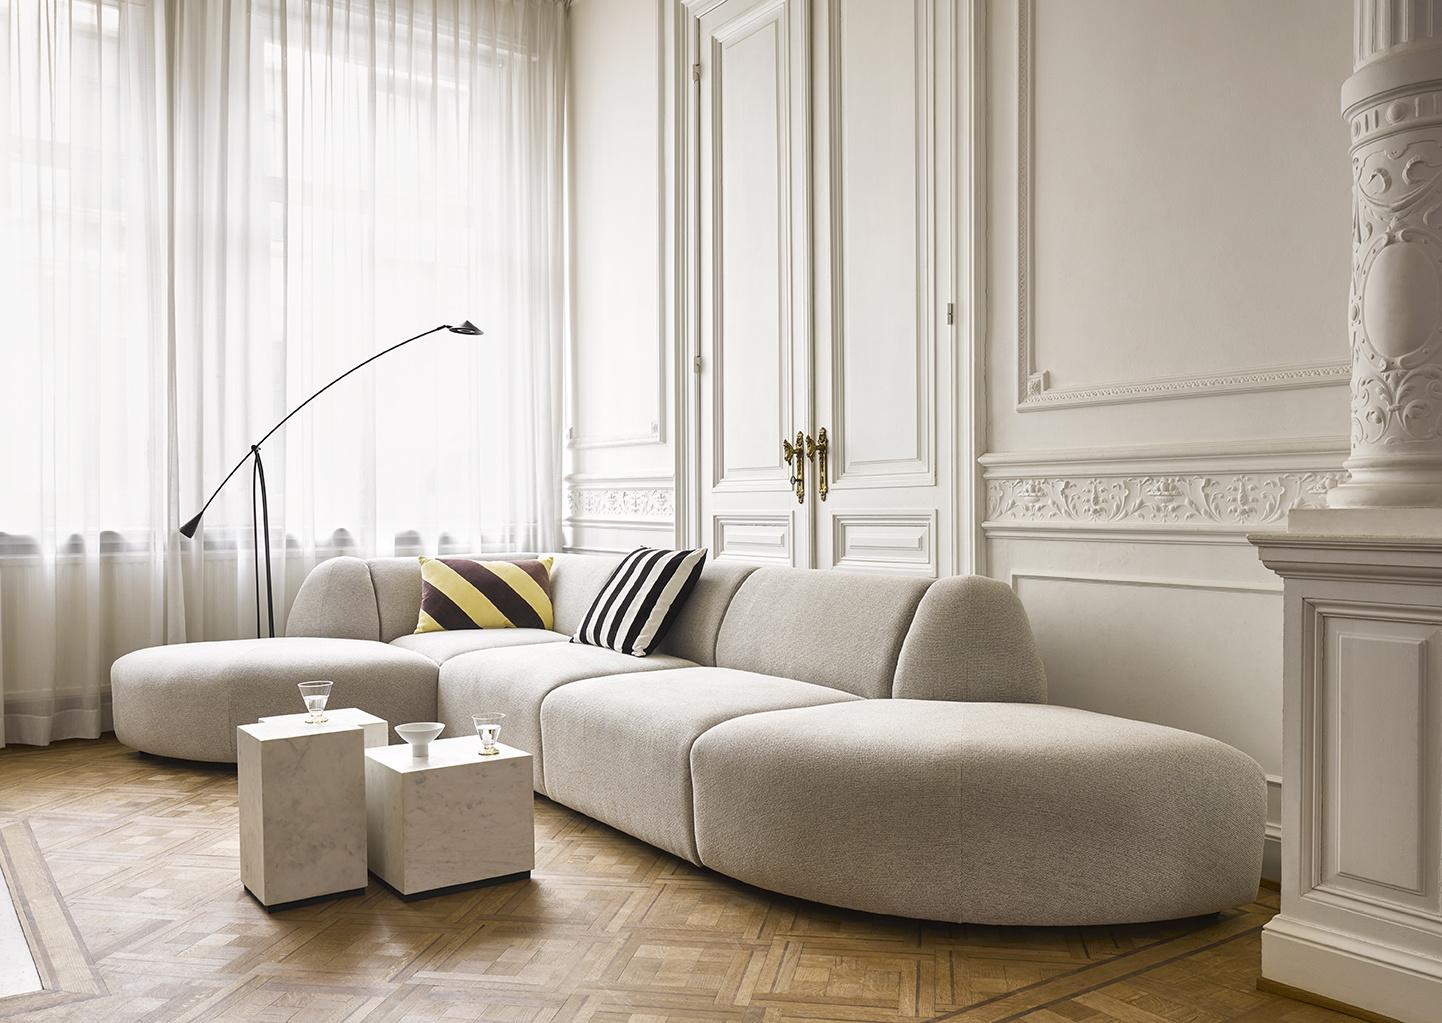 Bank jax couch: element left, sneak, light grey-3